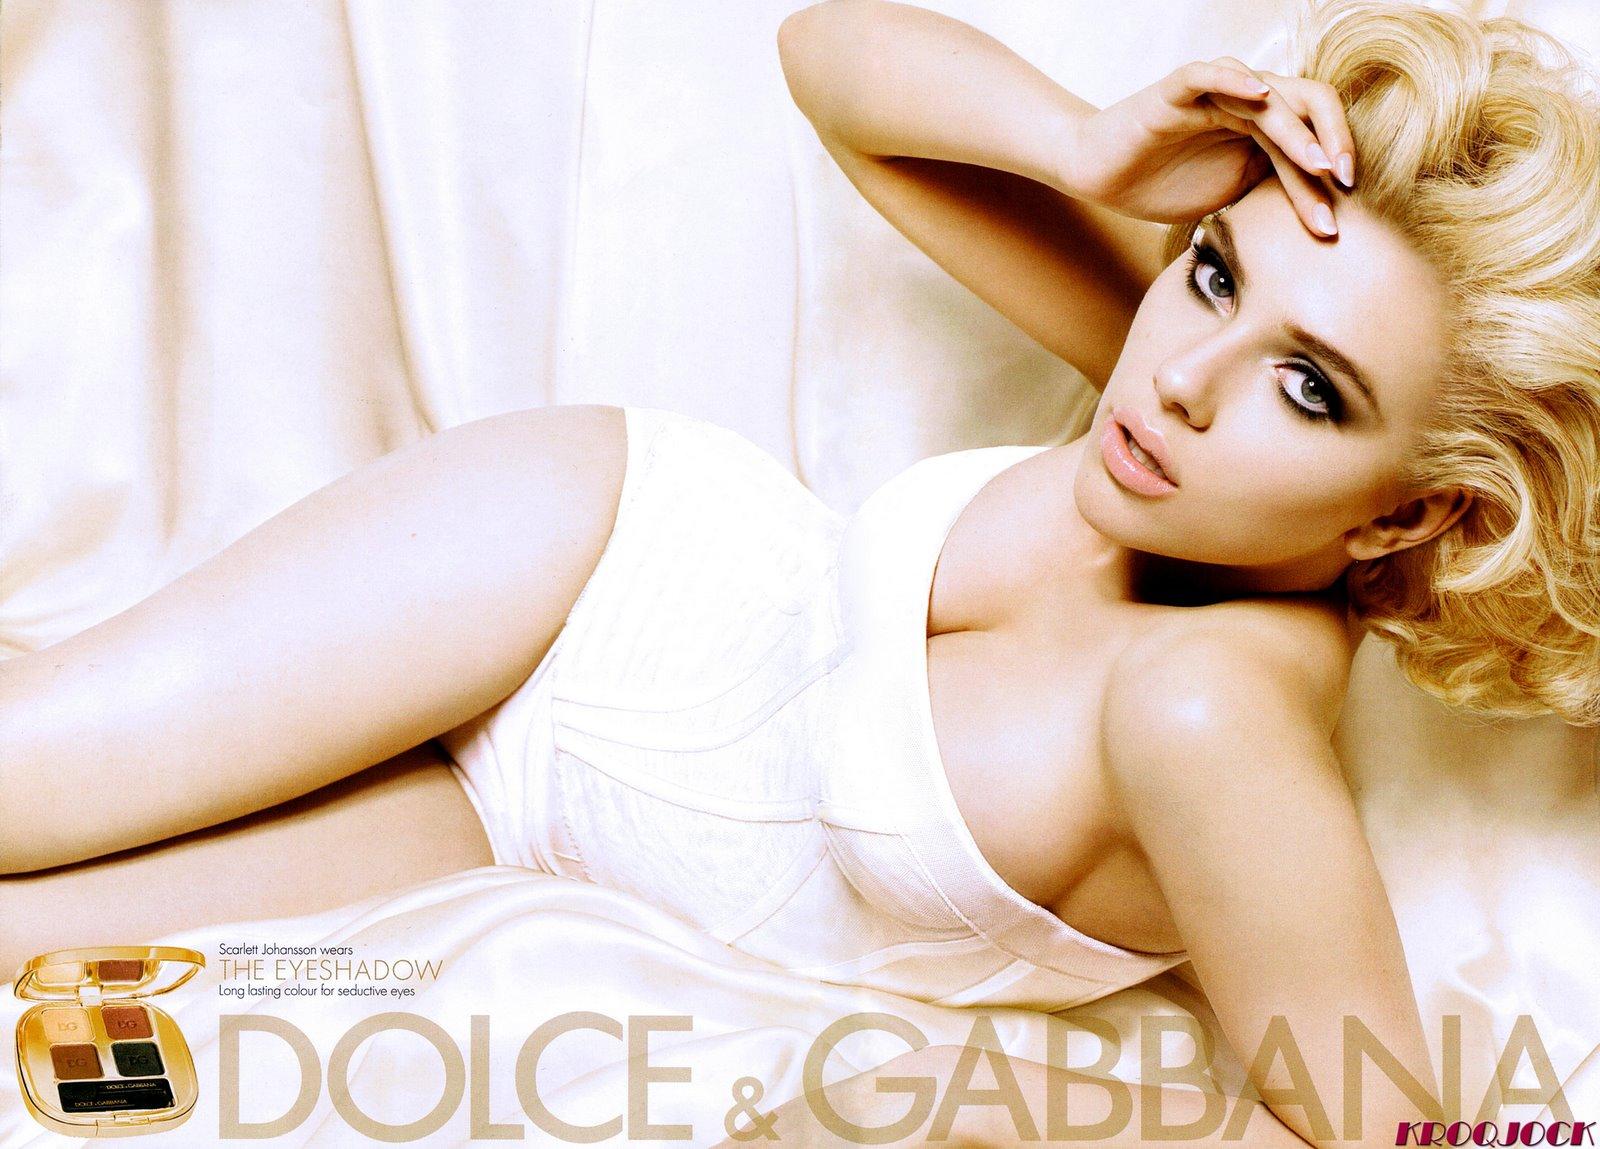 http://2.bp.blogspot.com/_vyCf6z7uw8E/Sa32EDMSueI/AAAAAAAAjoA/0918-e40E_I/s1600/42387_Scarlett_Johansson_DOLCE_GABBANA_Beauty_2009_Scanned_by_KROQJOCK_UHQ2_122_115lo.jpg